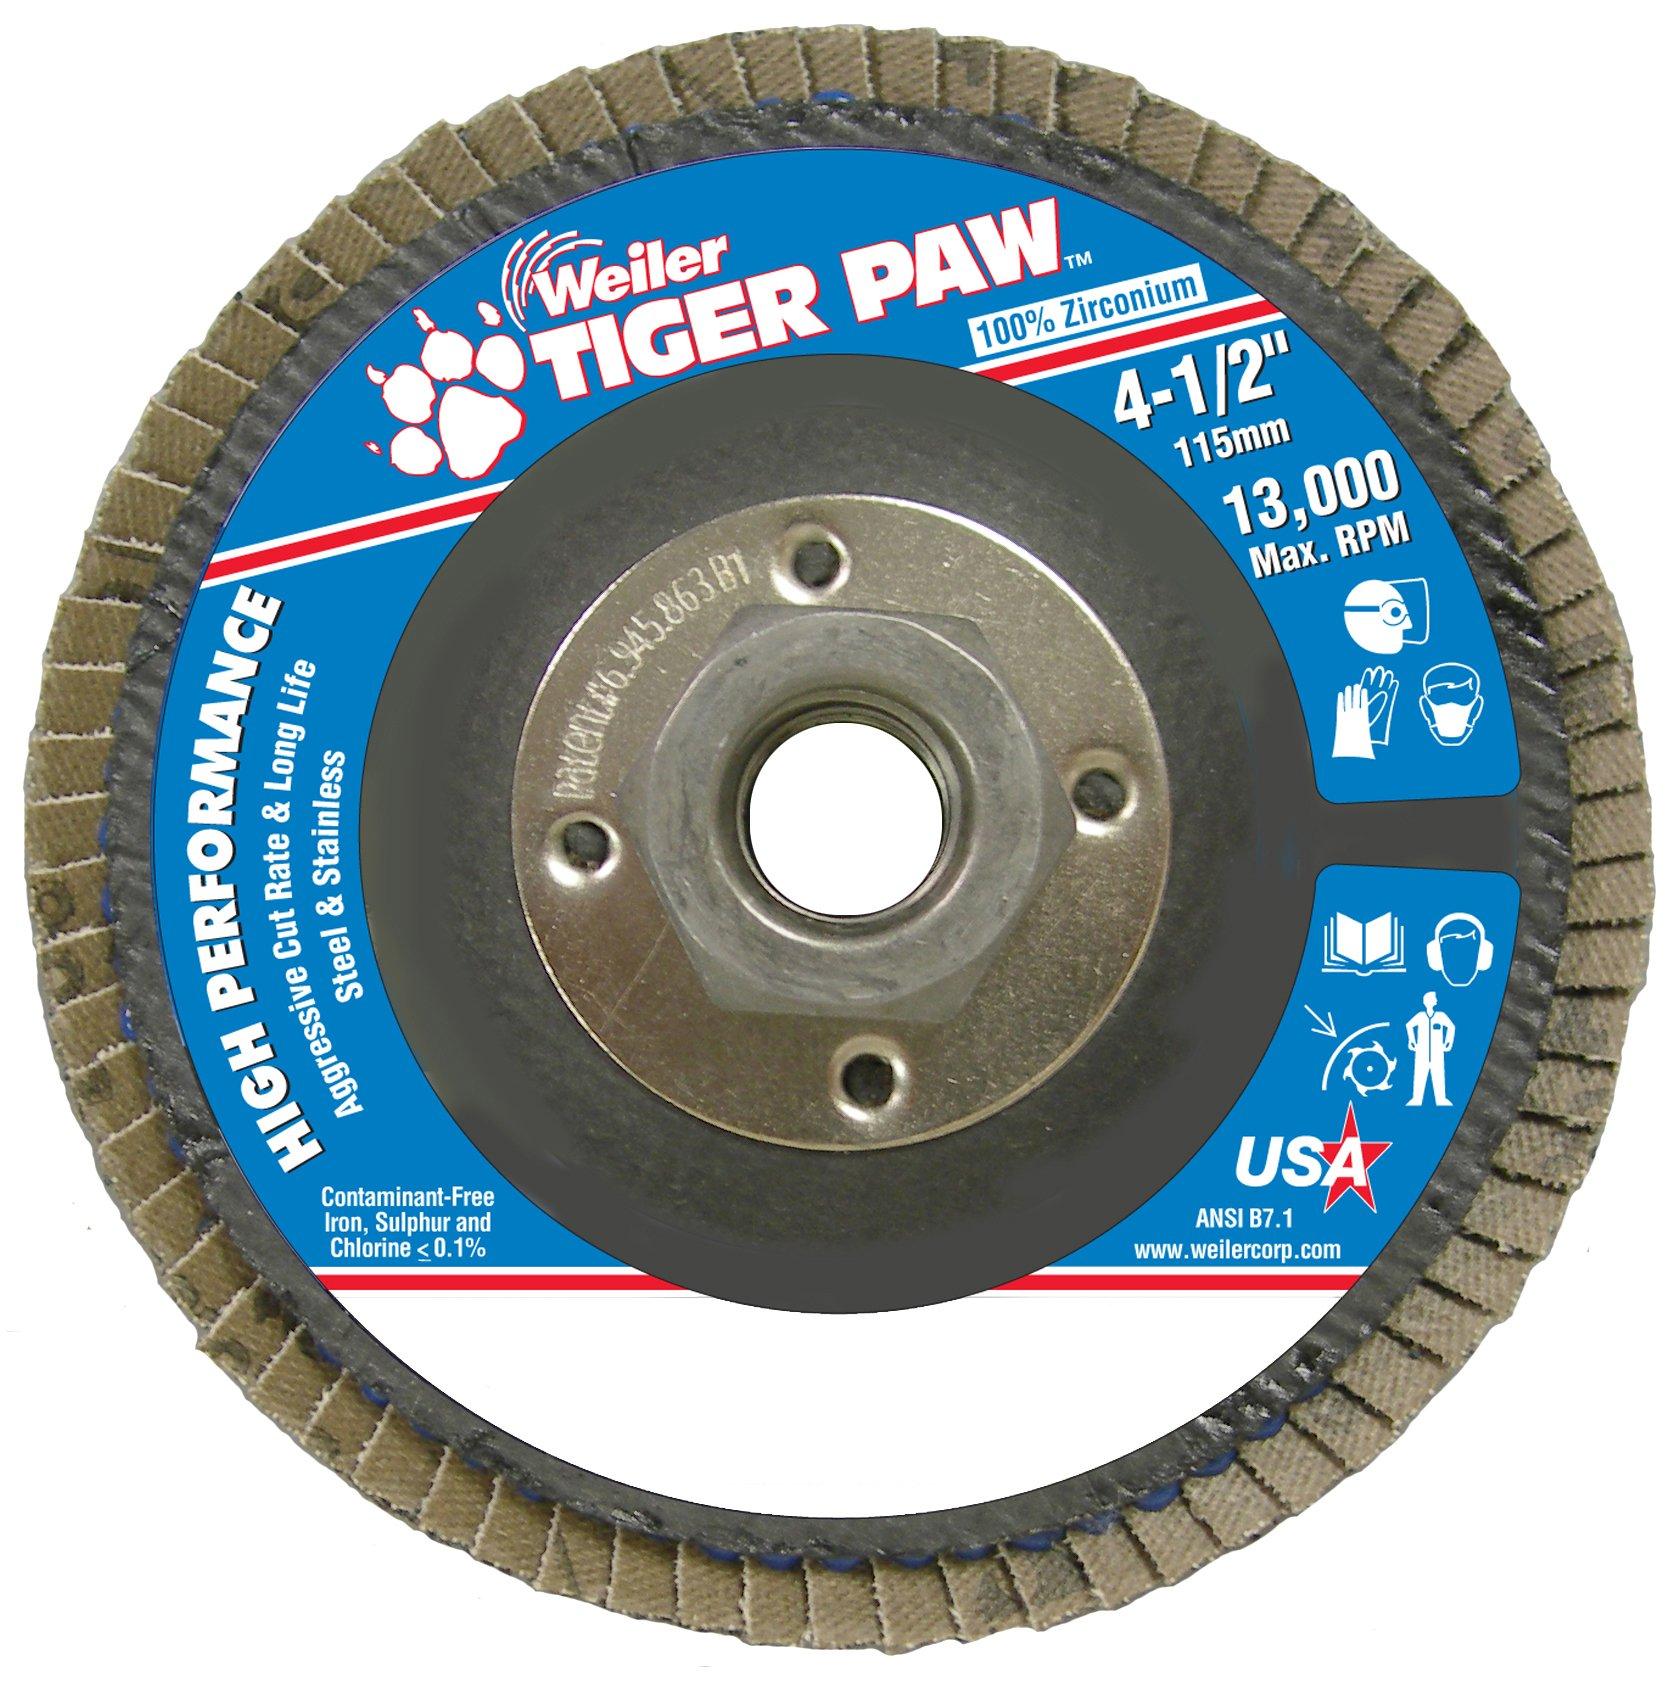 Weiler 51112 Tiger Paw High Performance Abrasive Flap Disc, Type 27 Flat Style, Phenolic Backing, Zirconia Alumina, 4-1/2'' Diameter, 5/8''-11 Arbor, 36 Grit, 13000 RPM (Pack of 10)